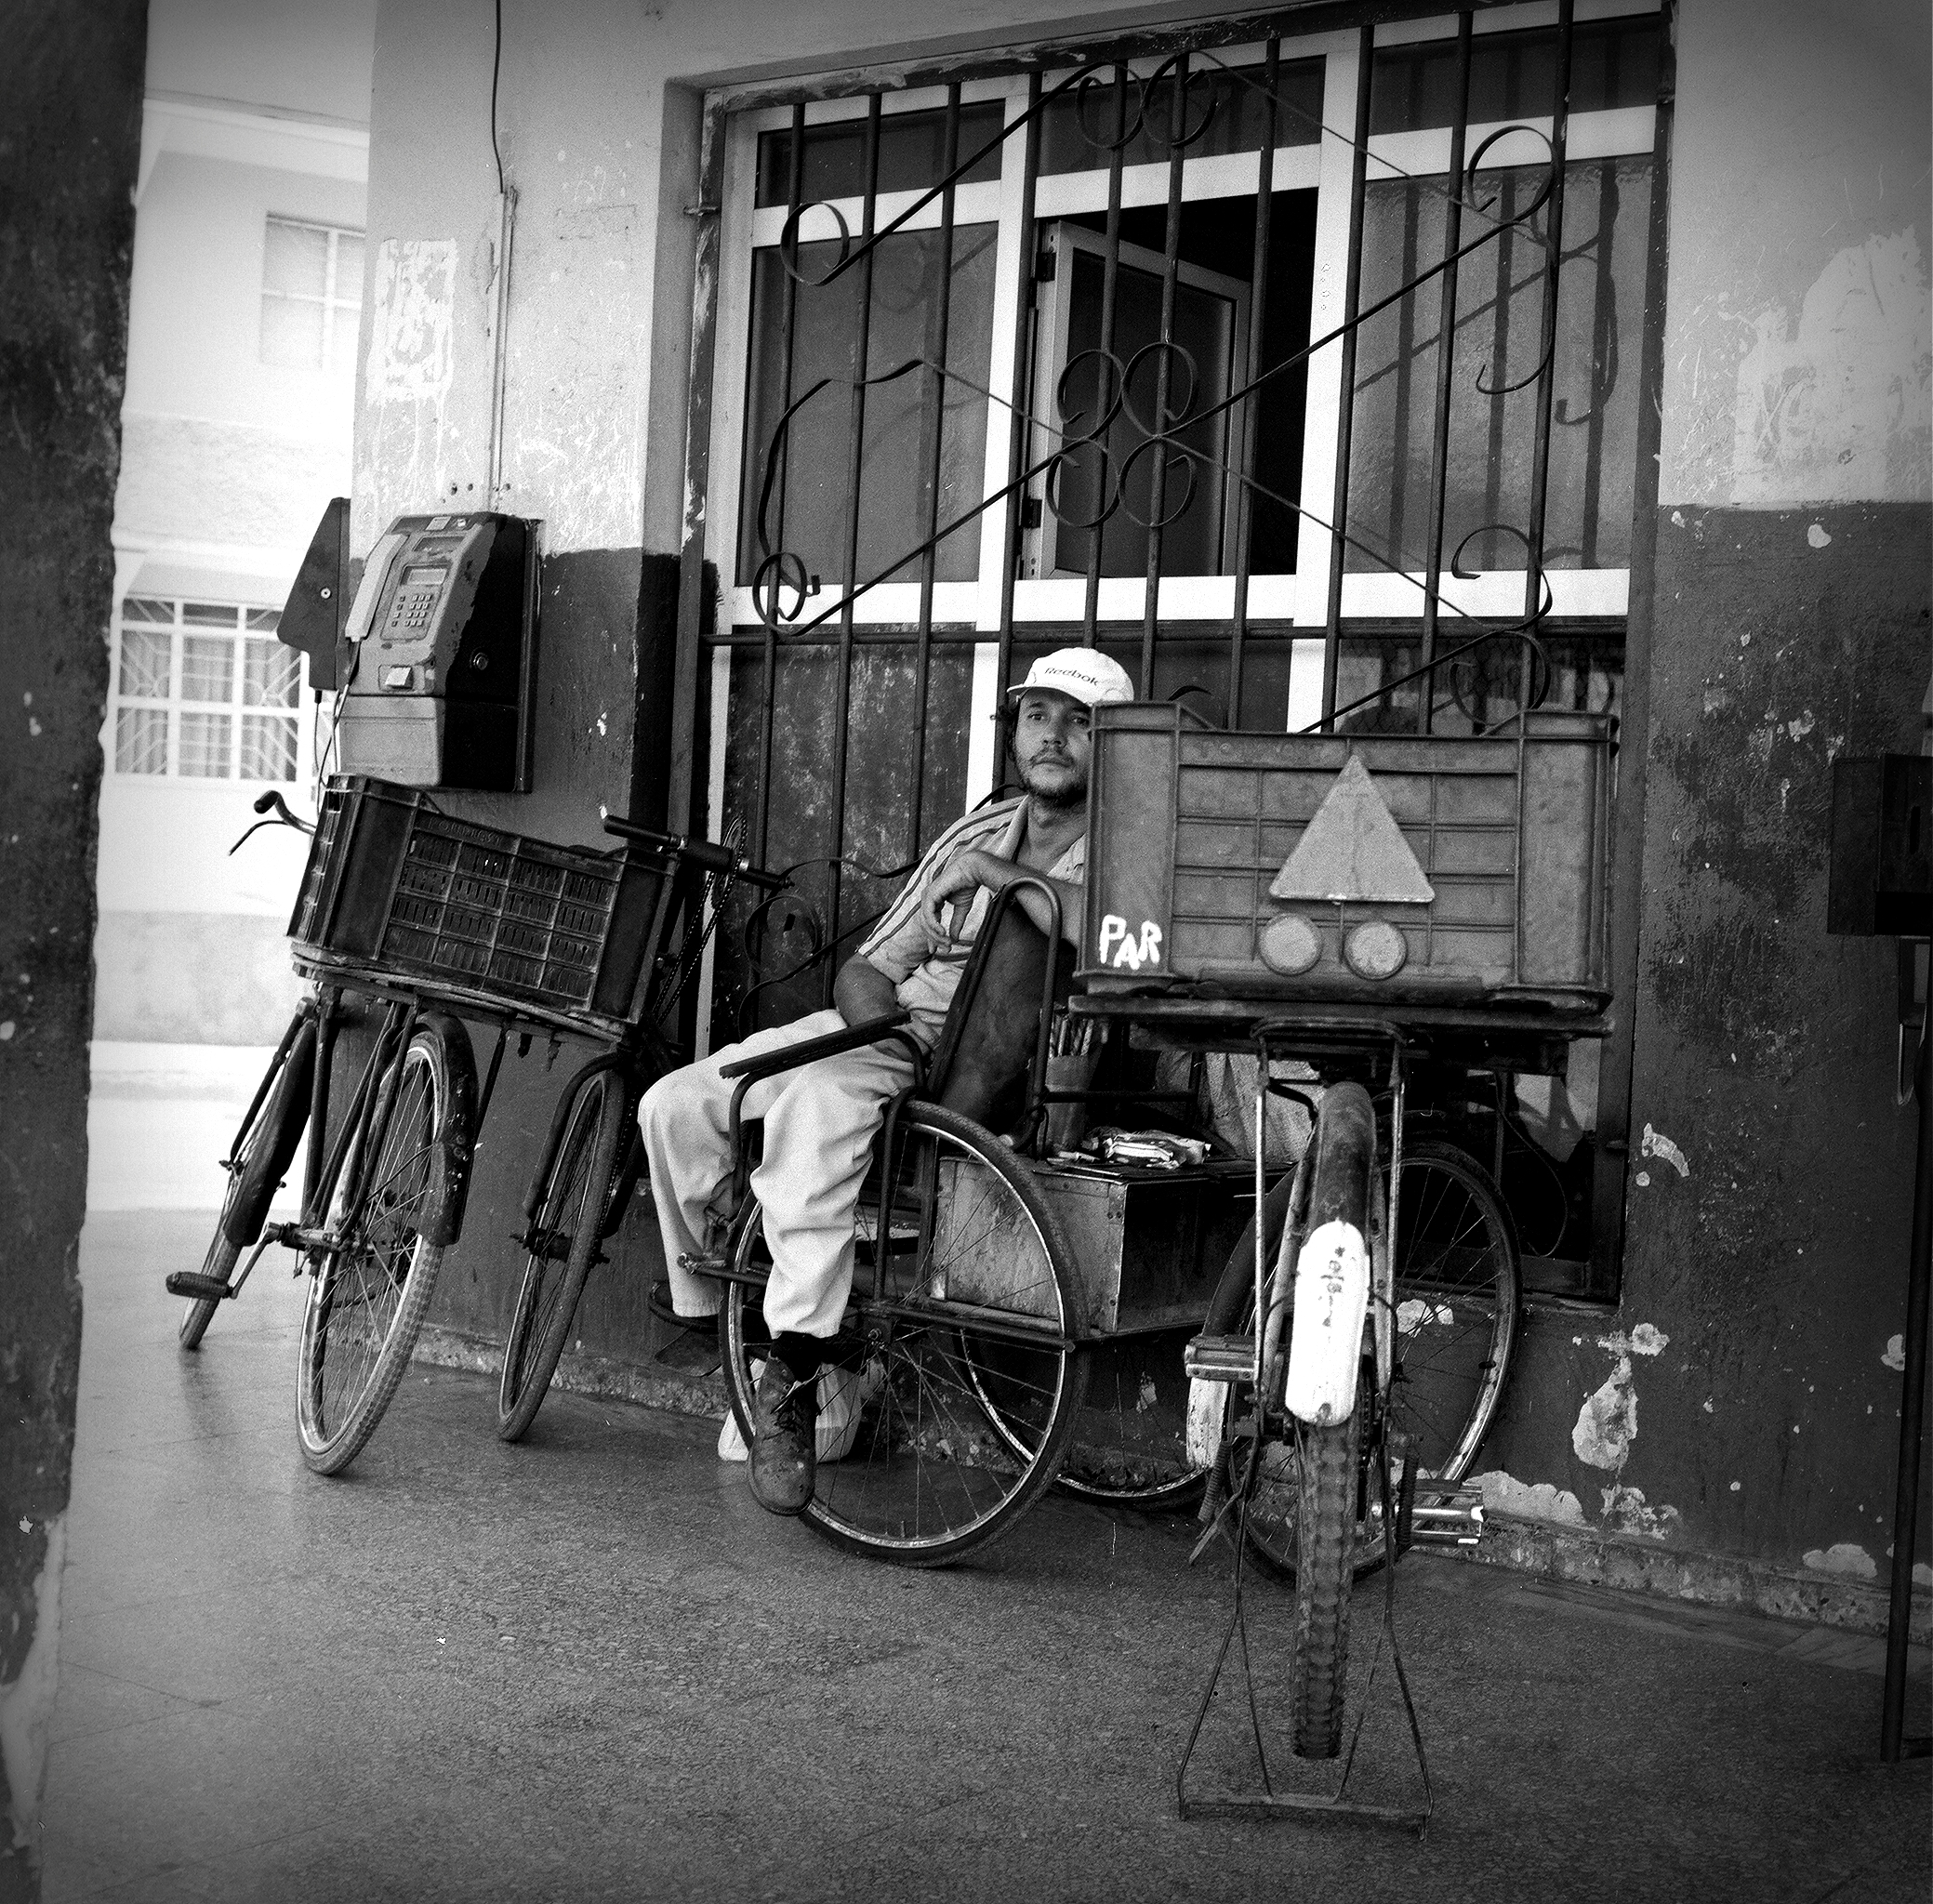 Waiting - Havana, Cuba